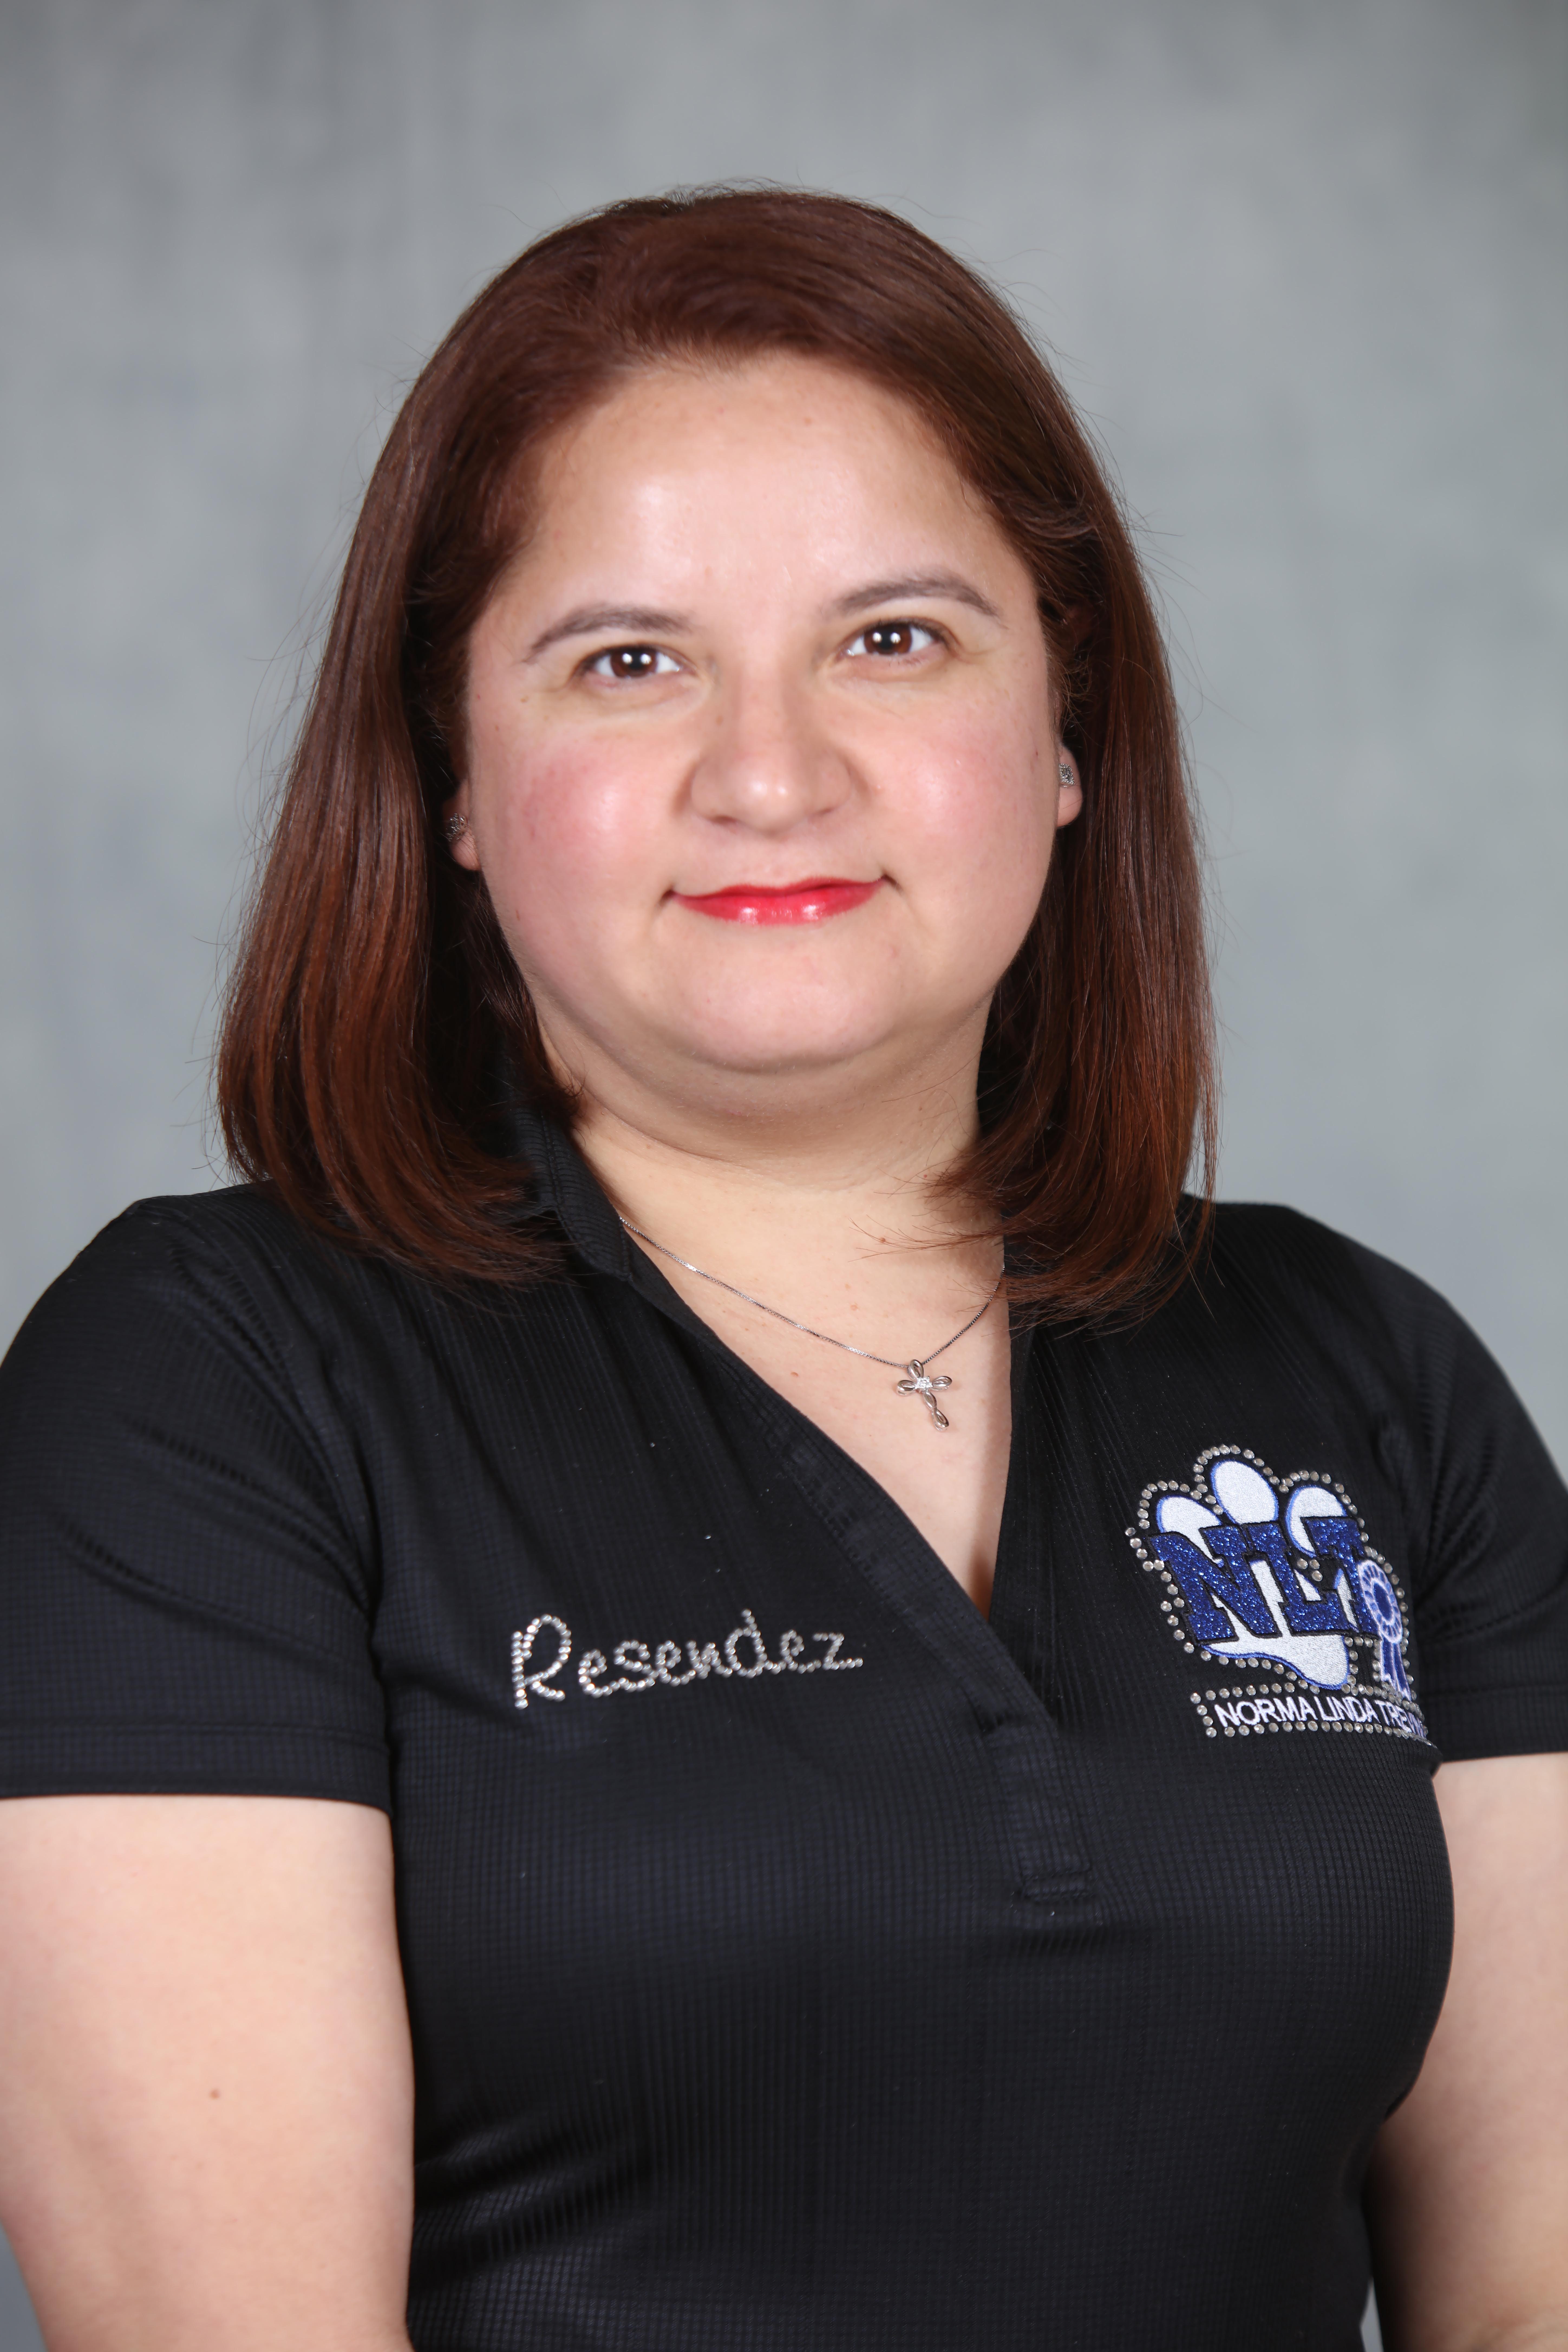 Johana Resendez- Trevino